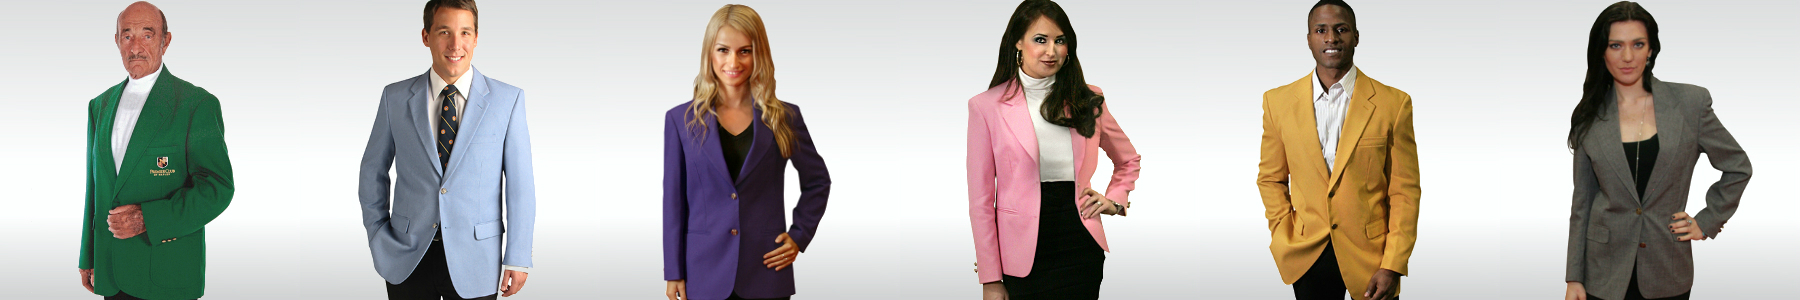 Uniform Blazers for Men & Women